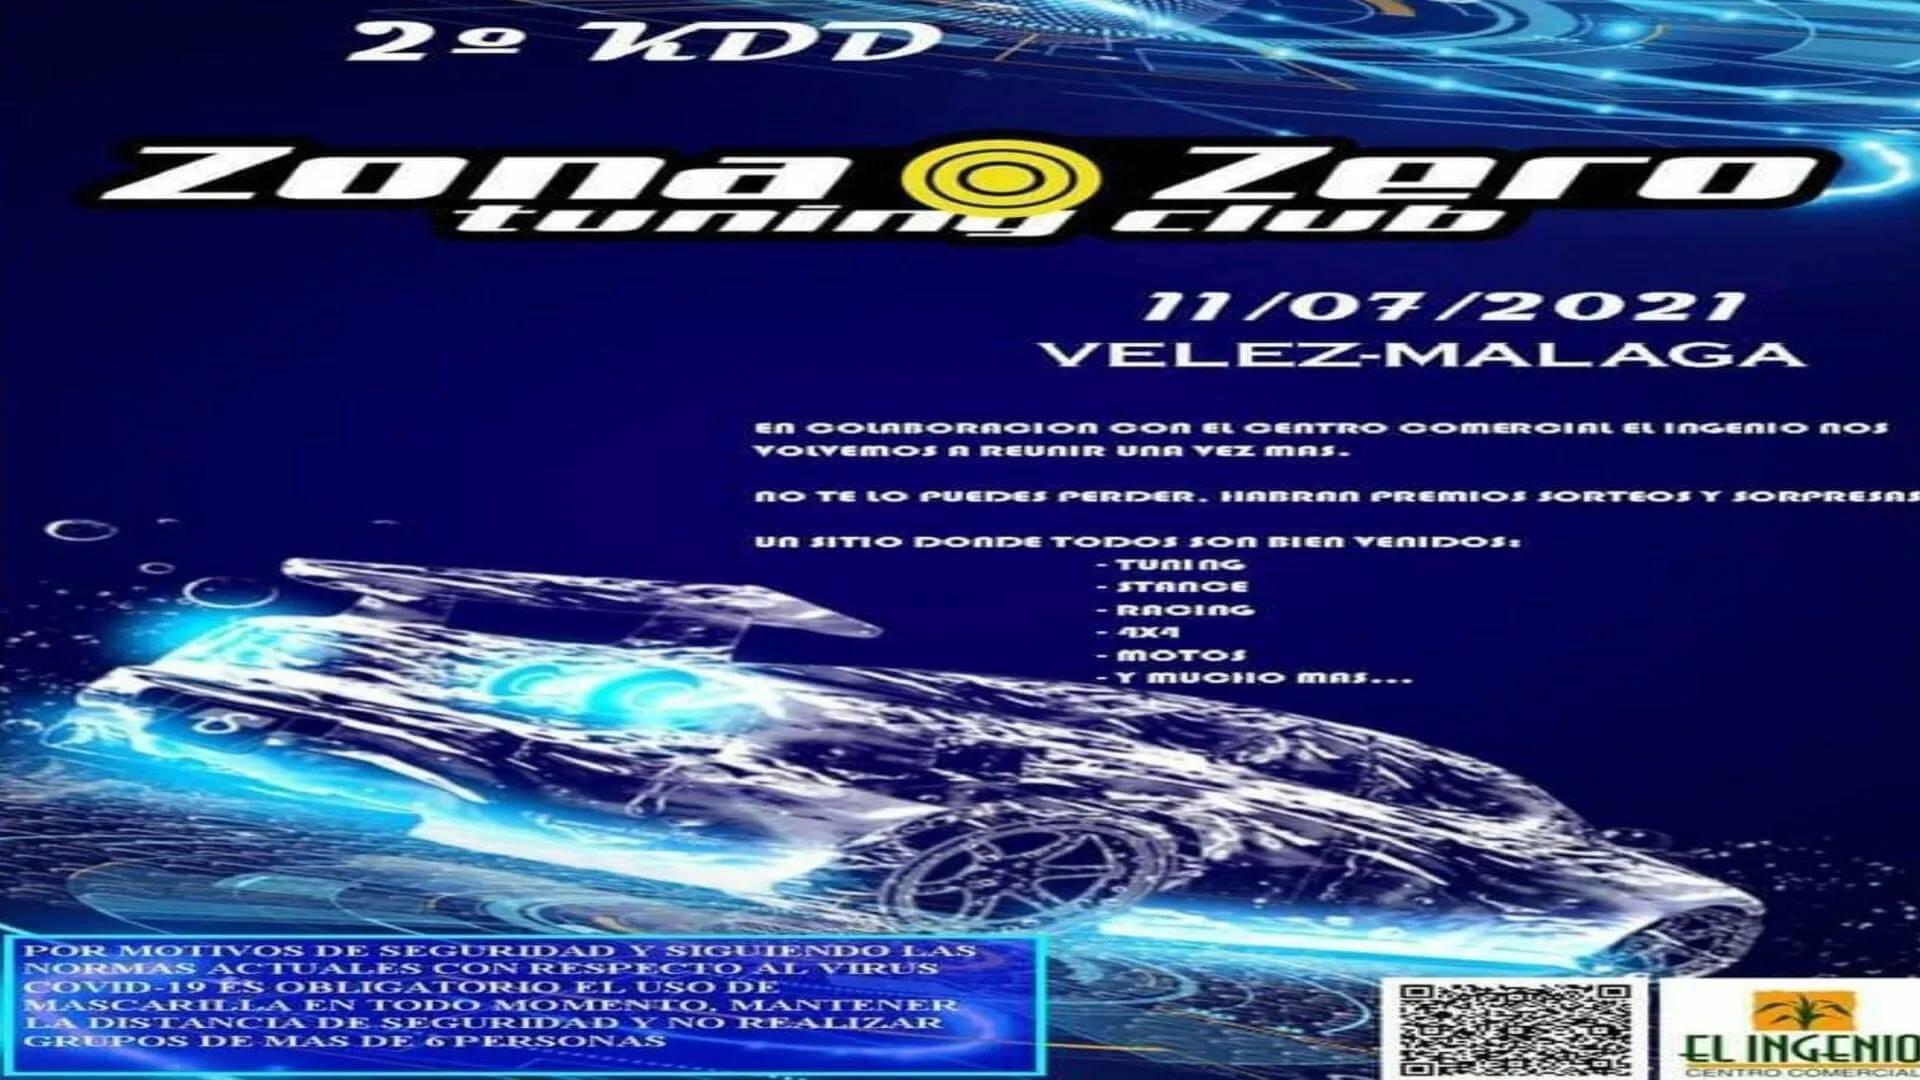 KDD tuning organizada por Zona Zero Tuning Club en Vélez-Málaga.